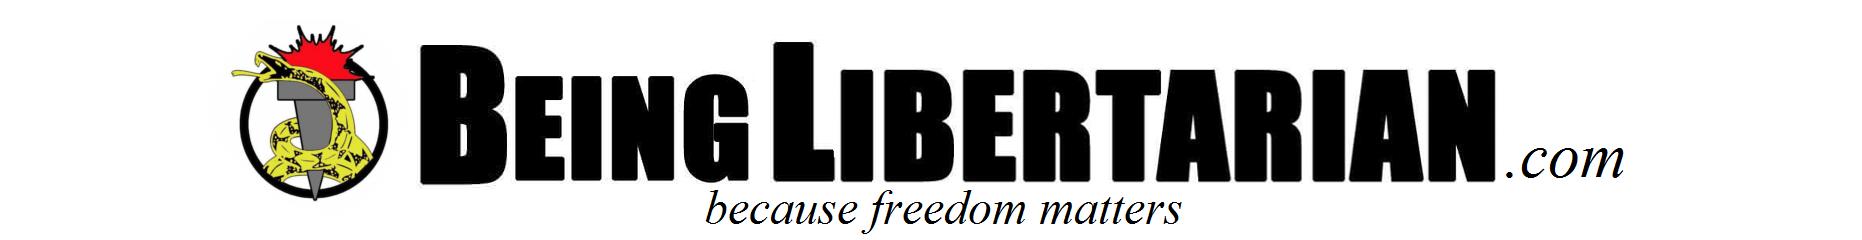 Being Libertarian